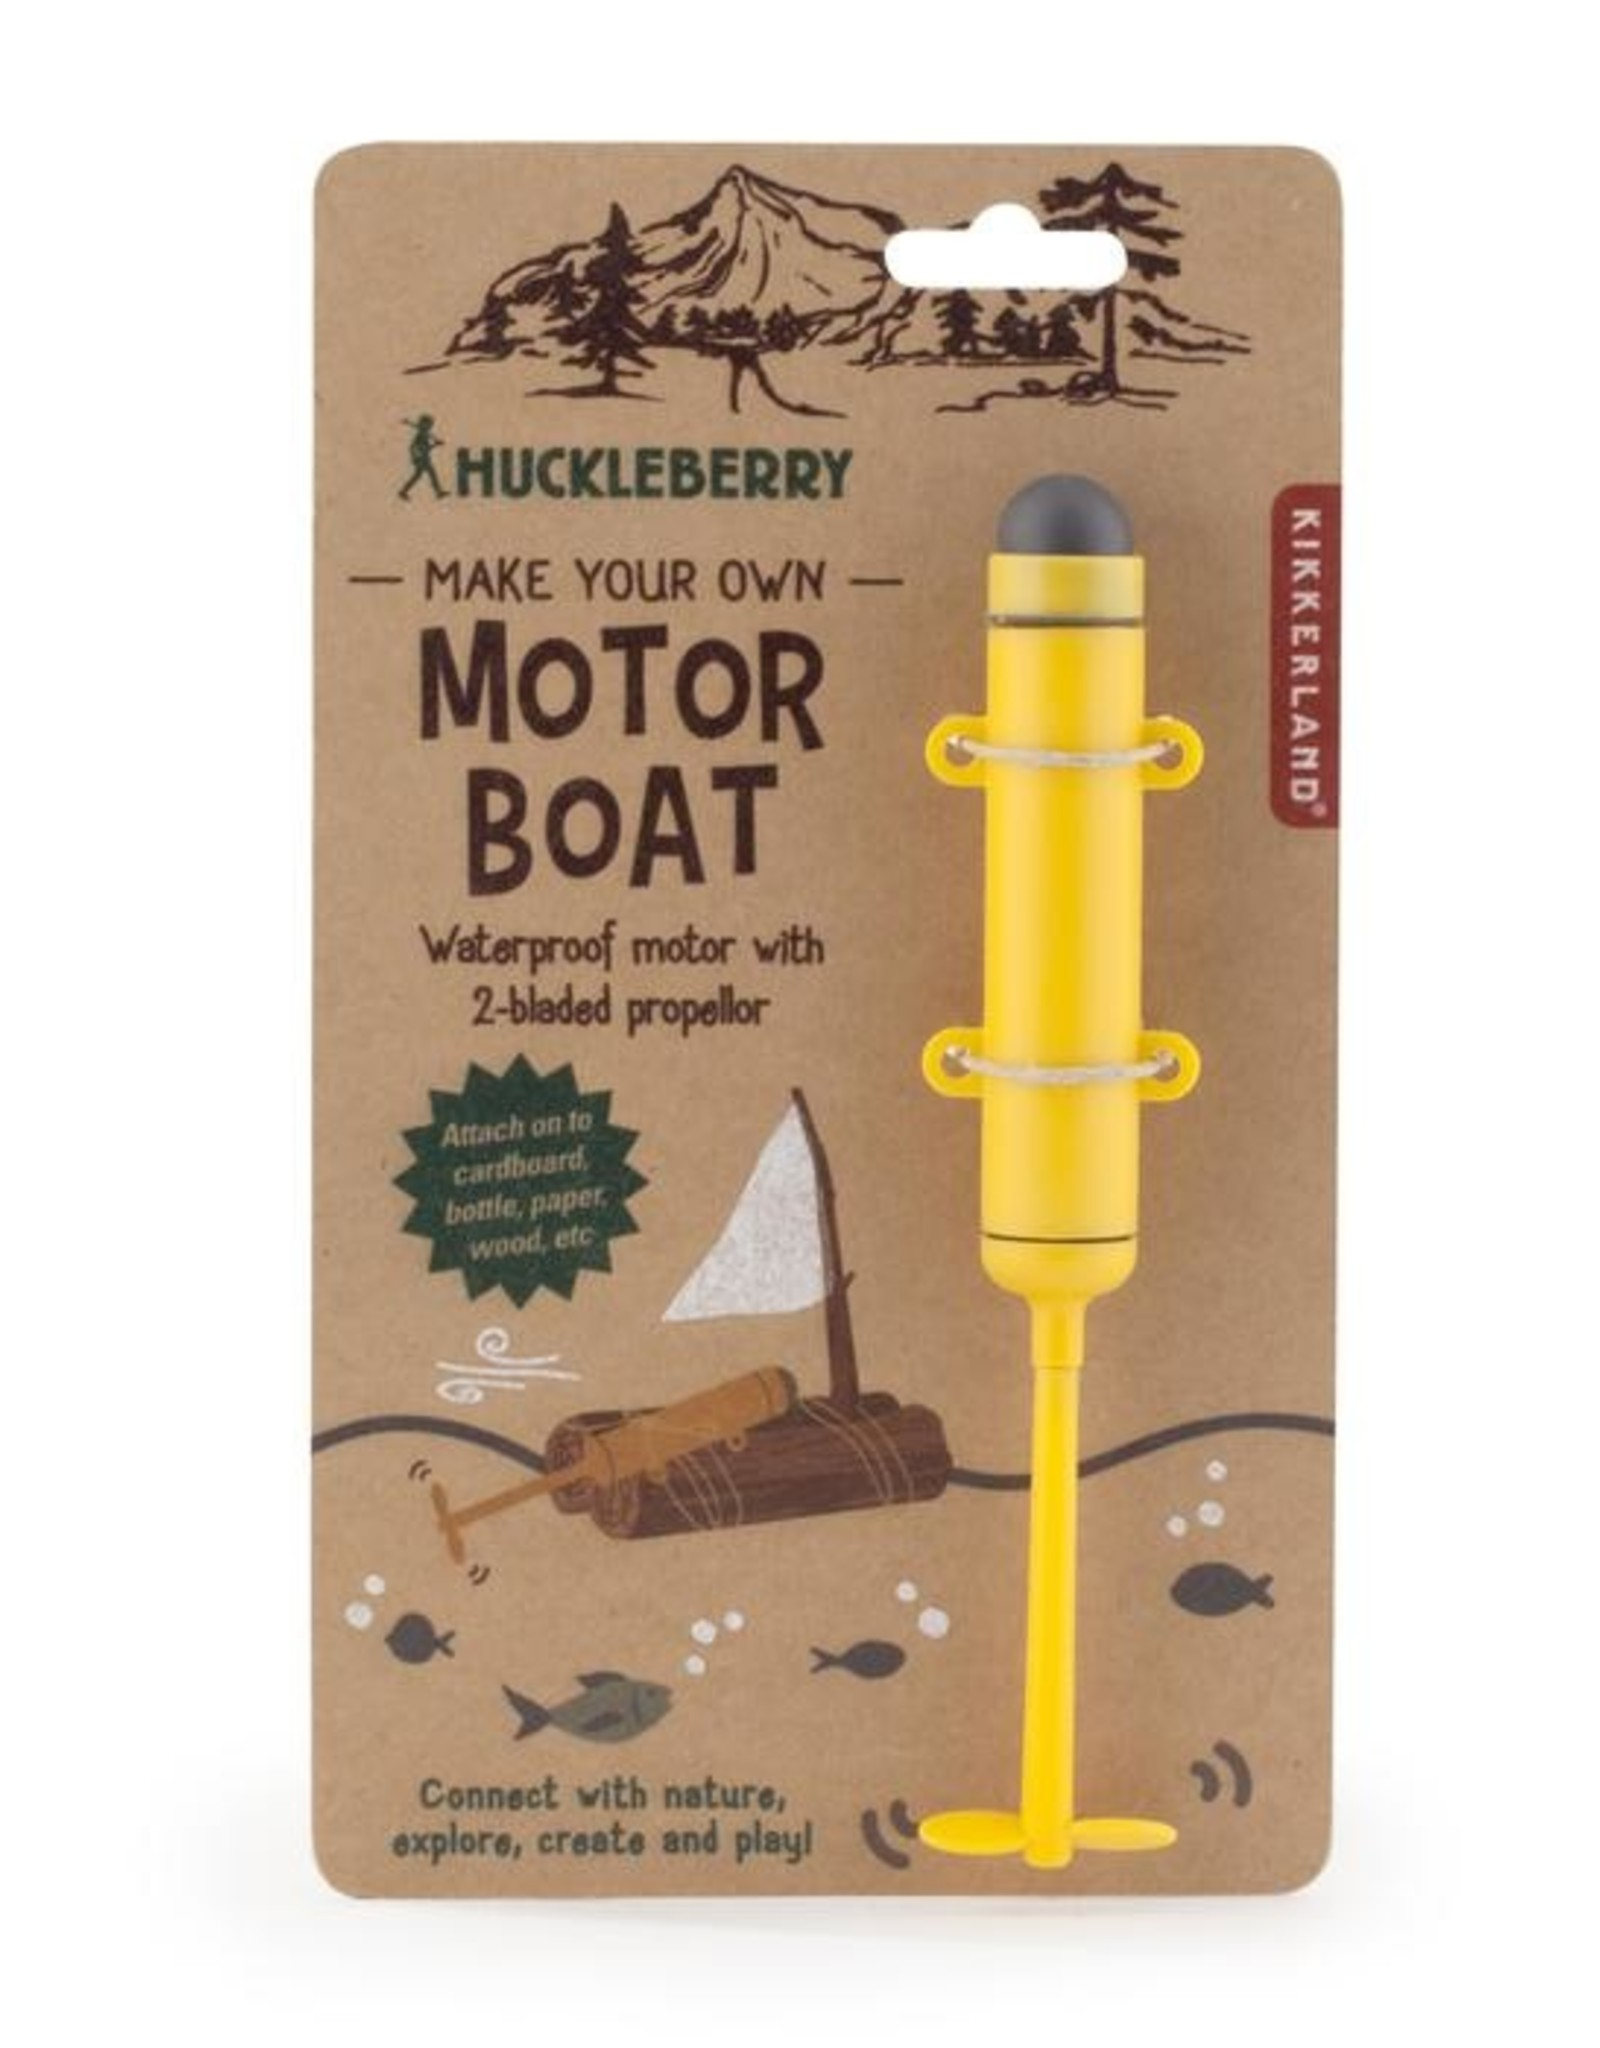 Kikkerland Huckleberry Make Your Own Motor Boat